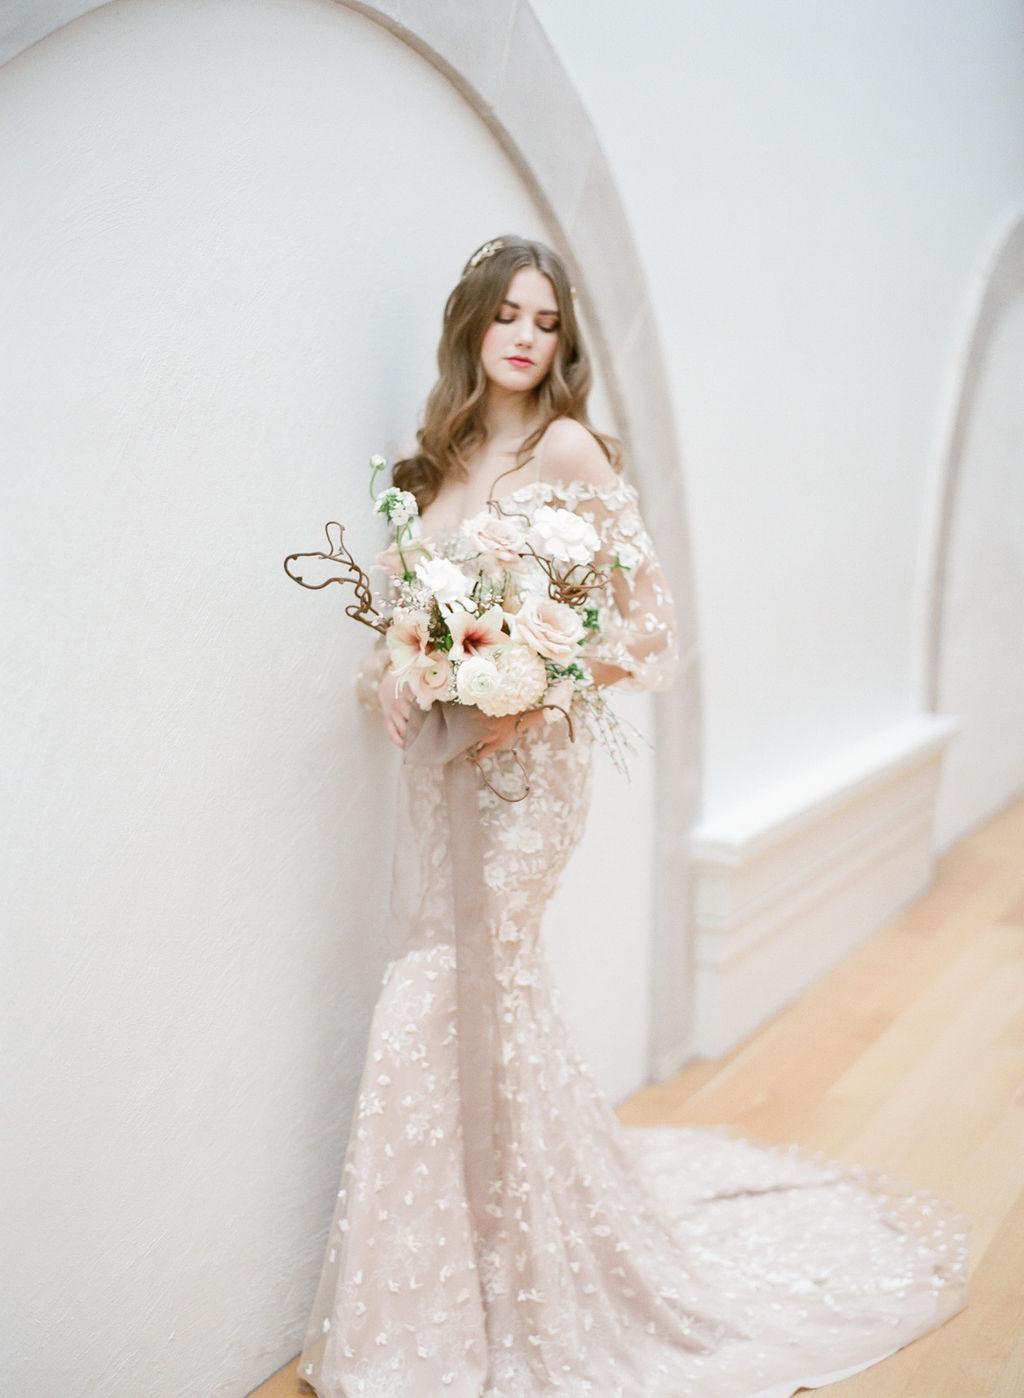 artiese-ago-wedding-editorial-000423700002.jpg